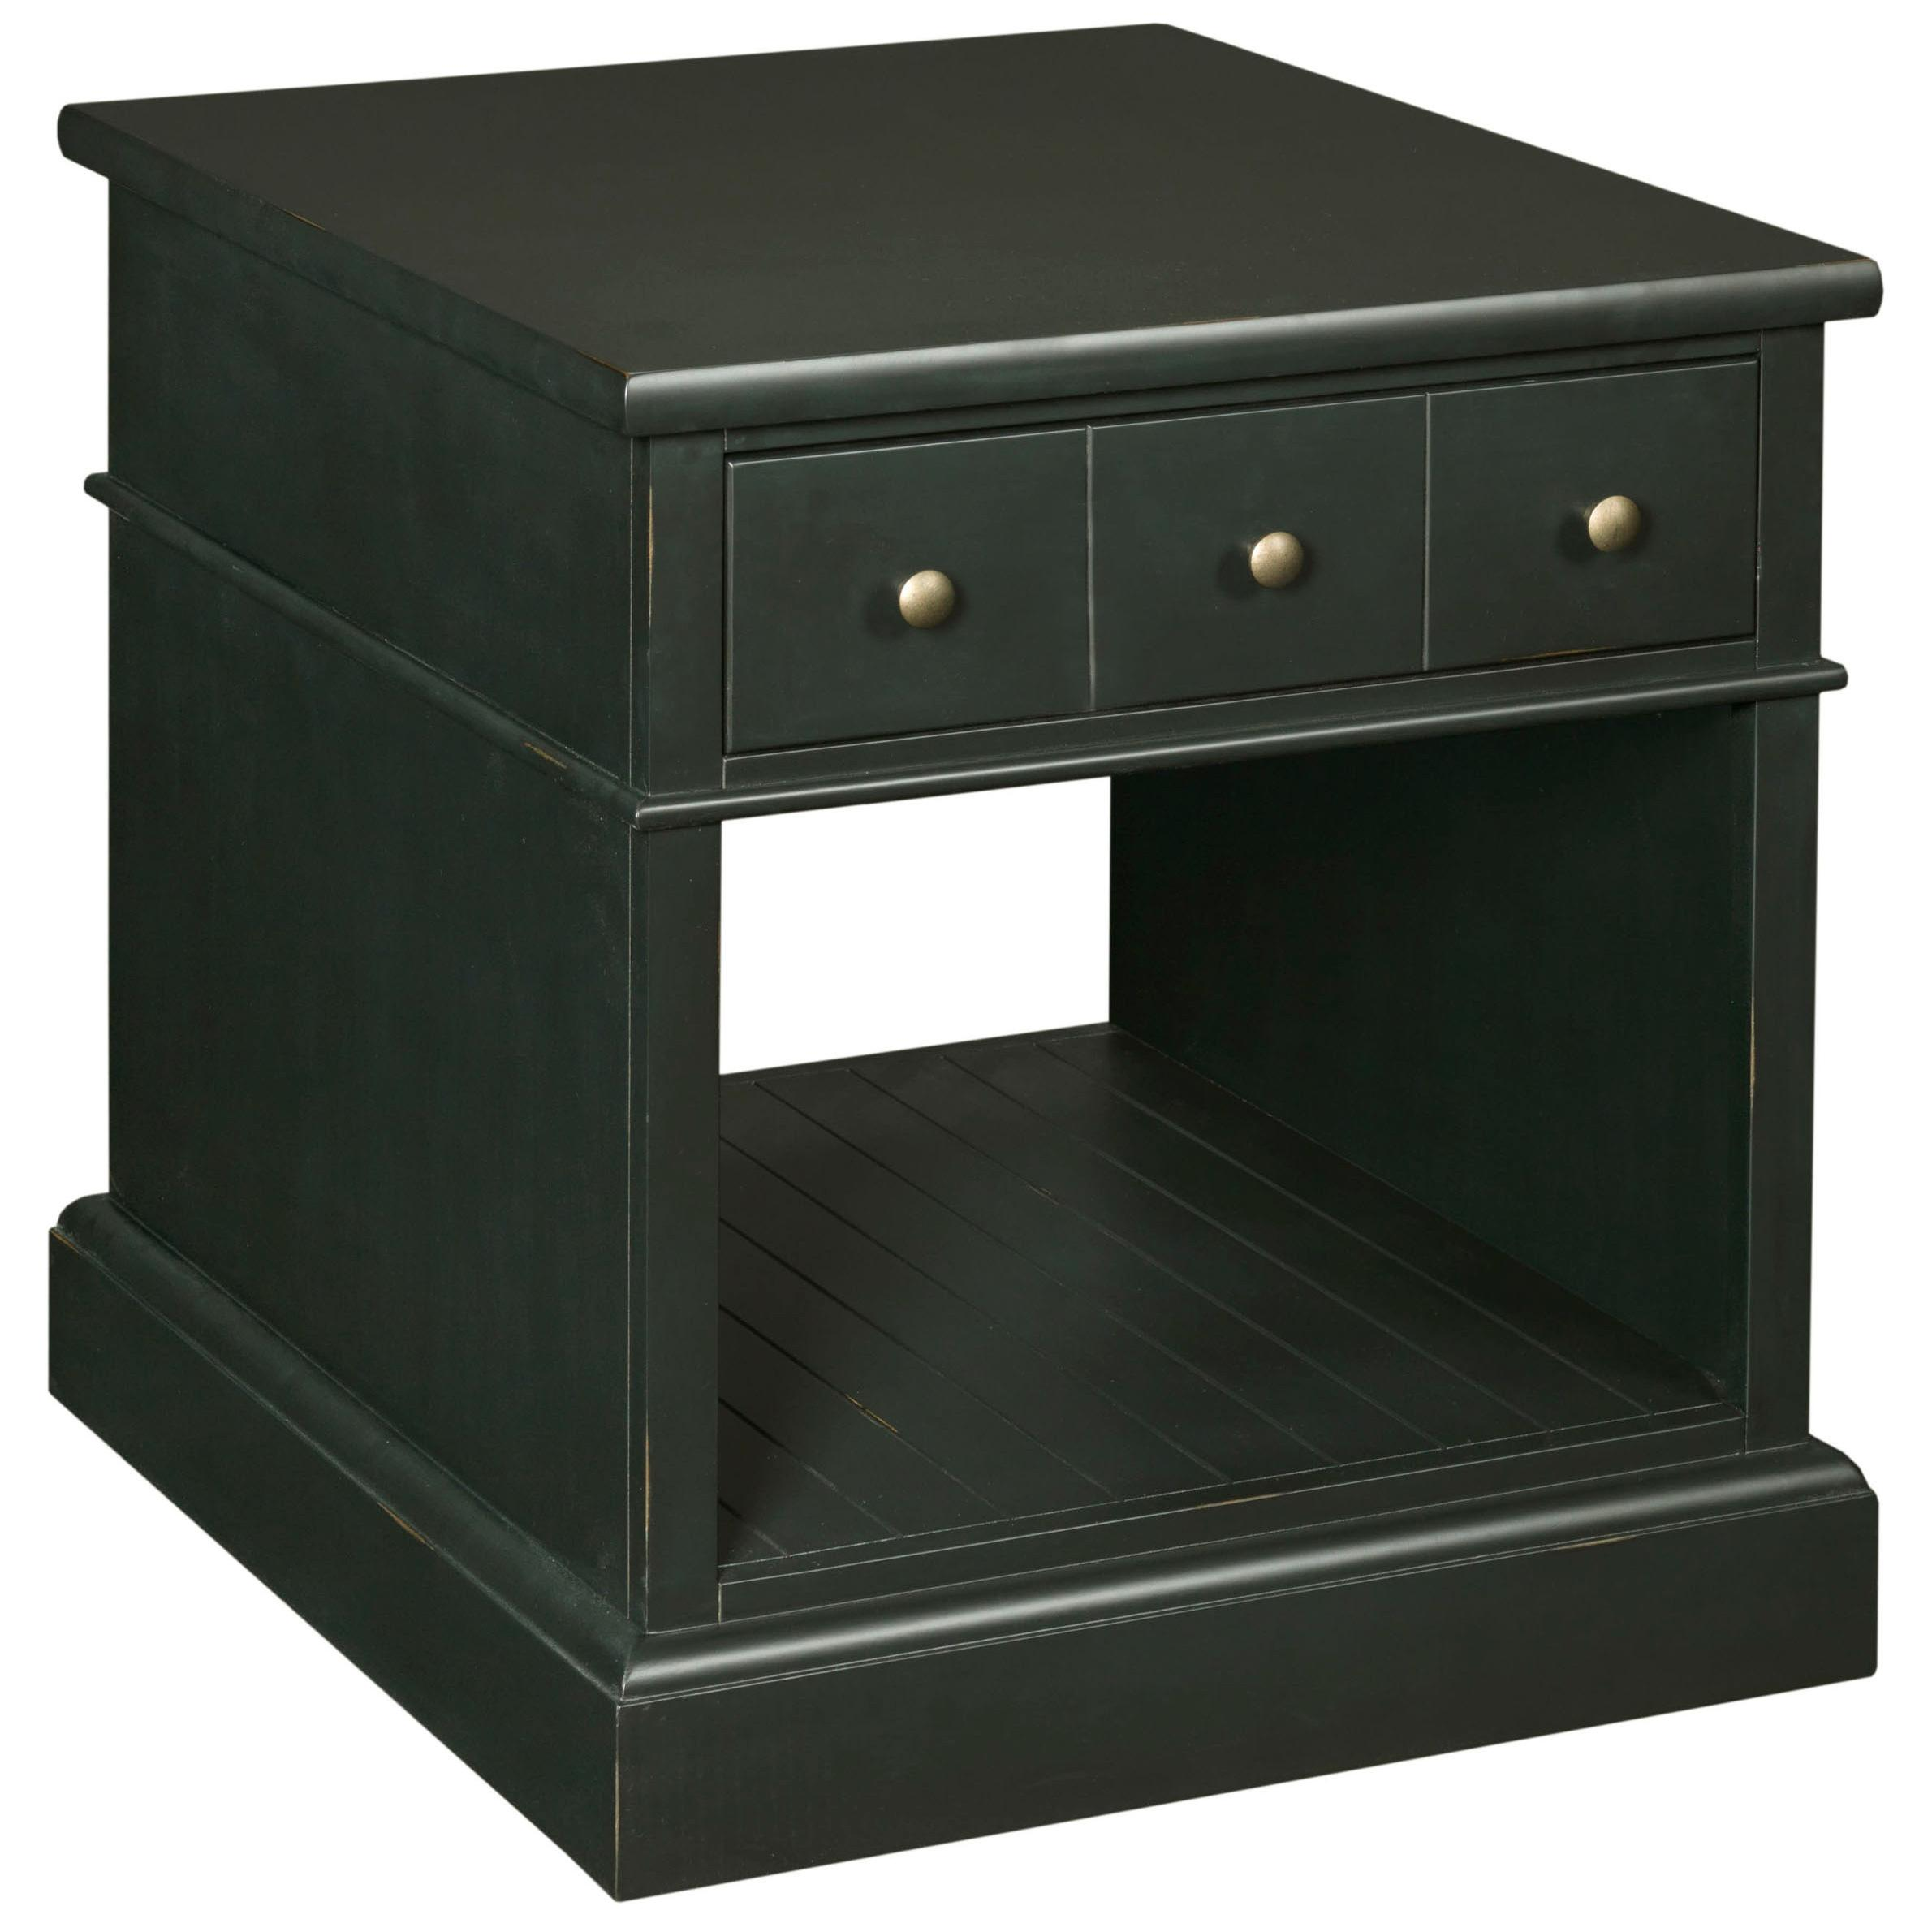 Broyhill Furniture New Vintage Drawer End Table - Item Number: 4809-012